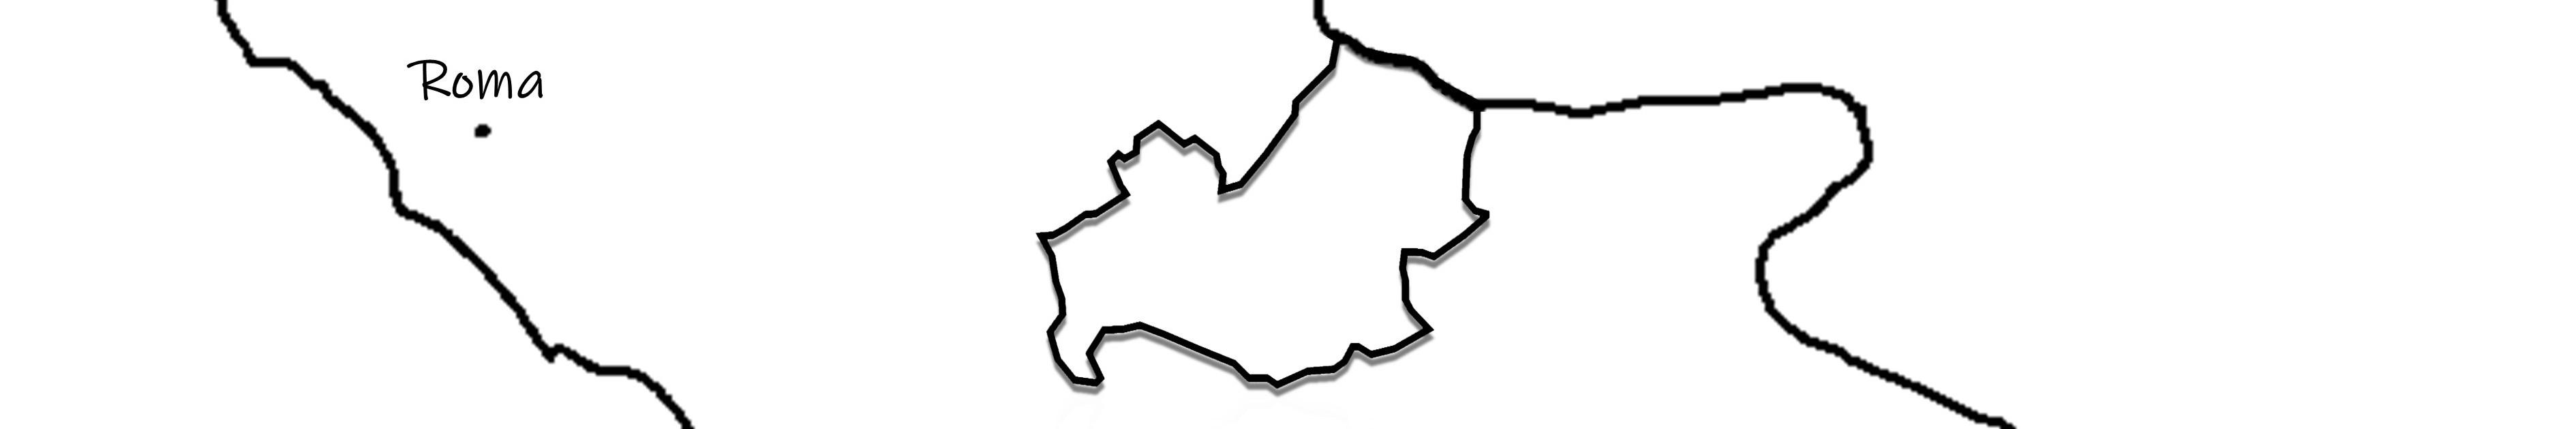 molise cartina geografica